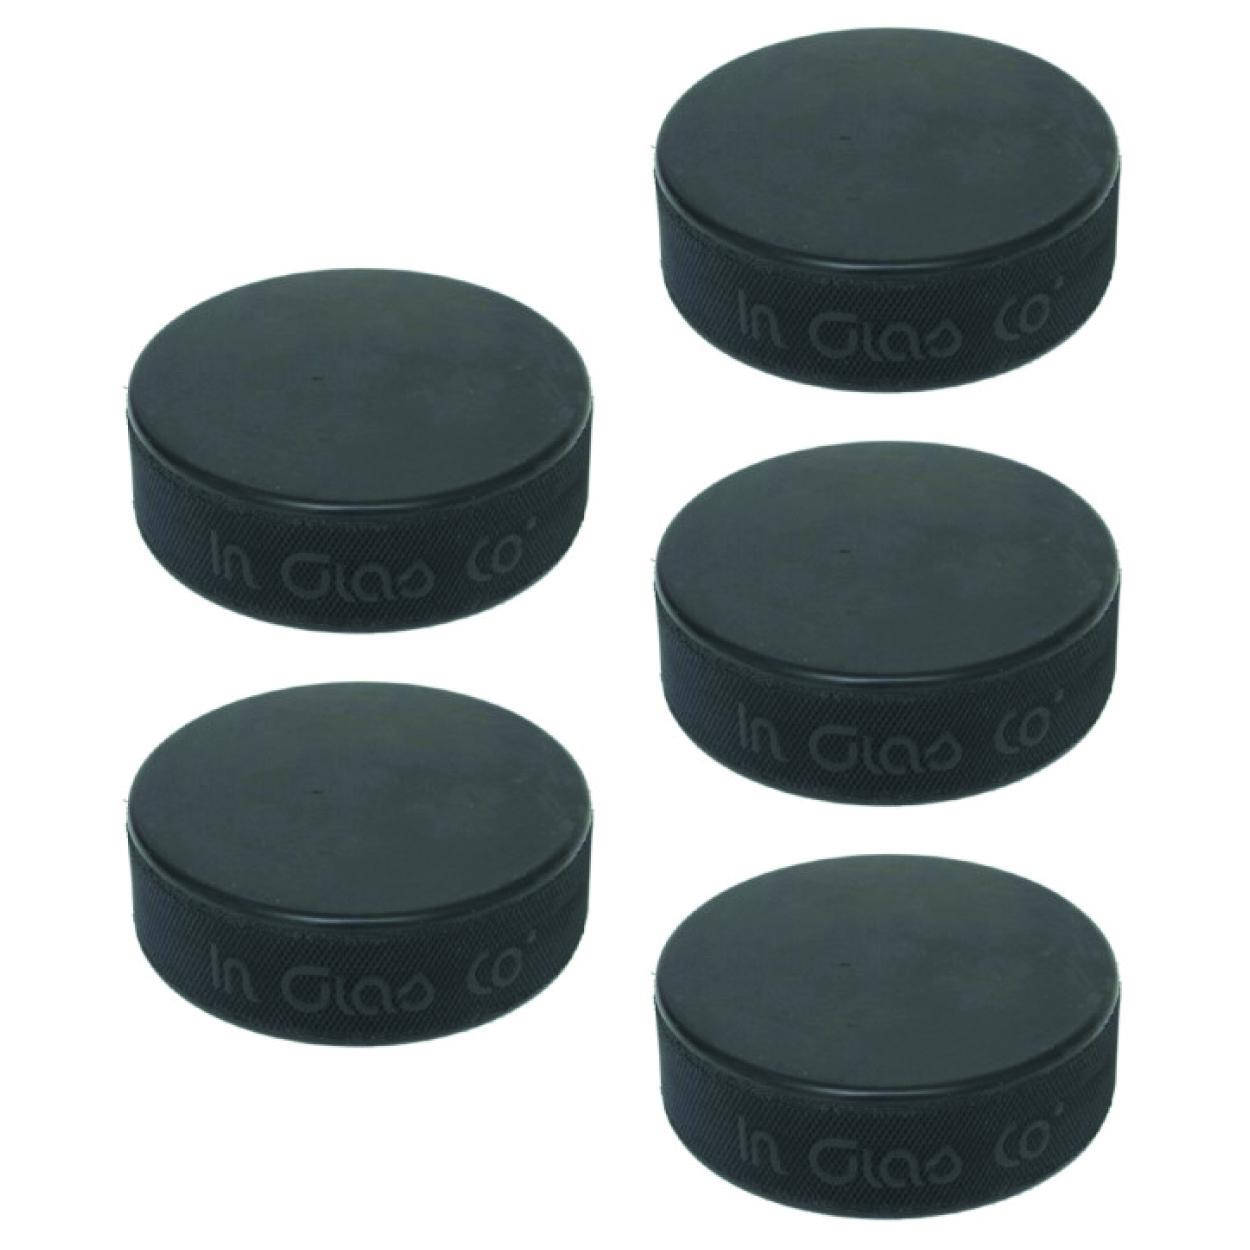 1250x1250 Ice Hockey Pucks